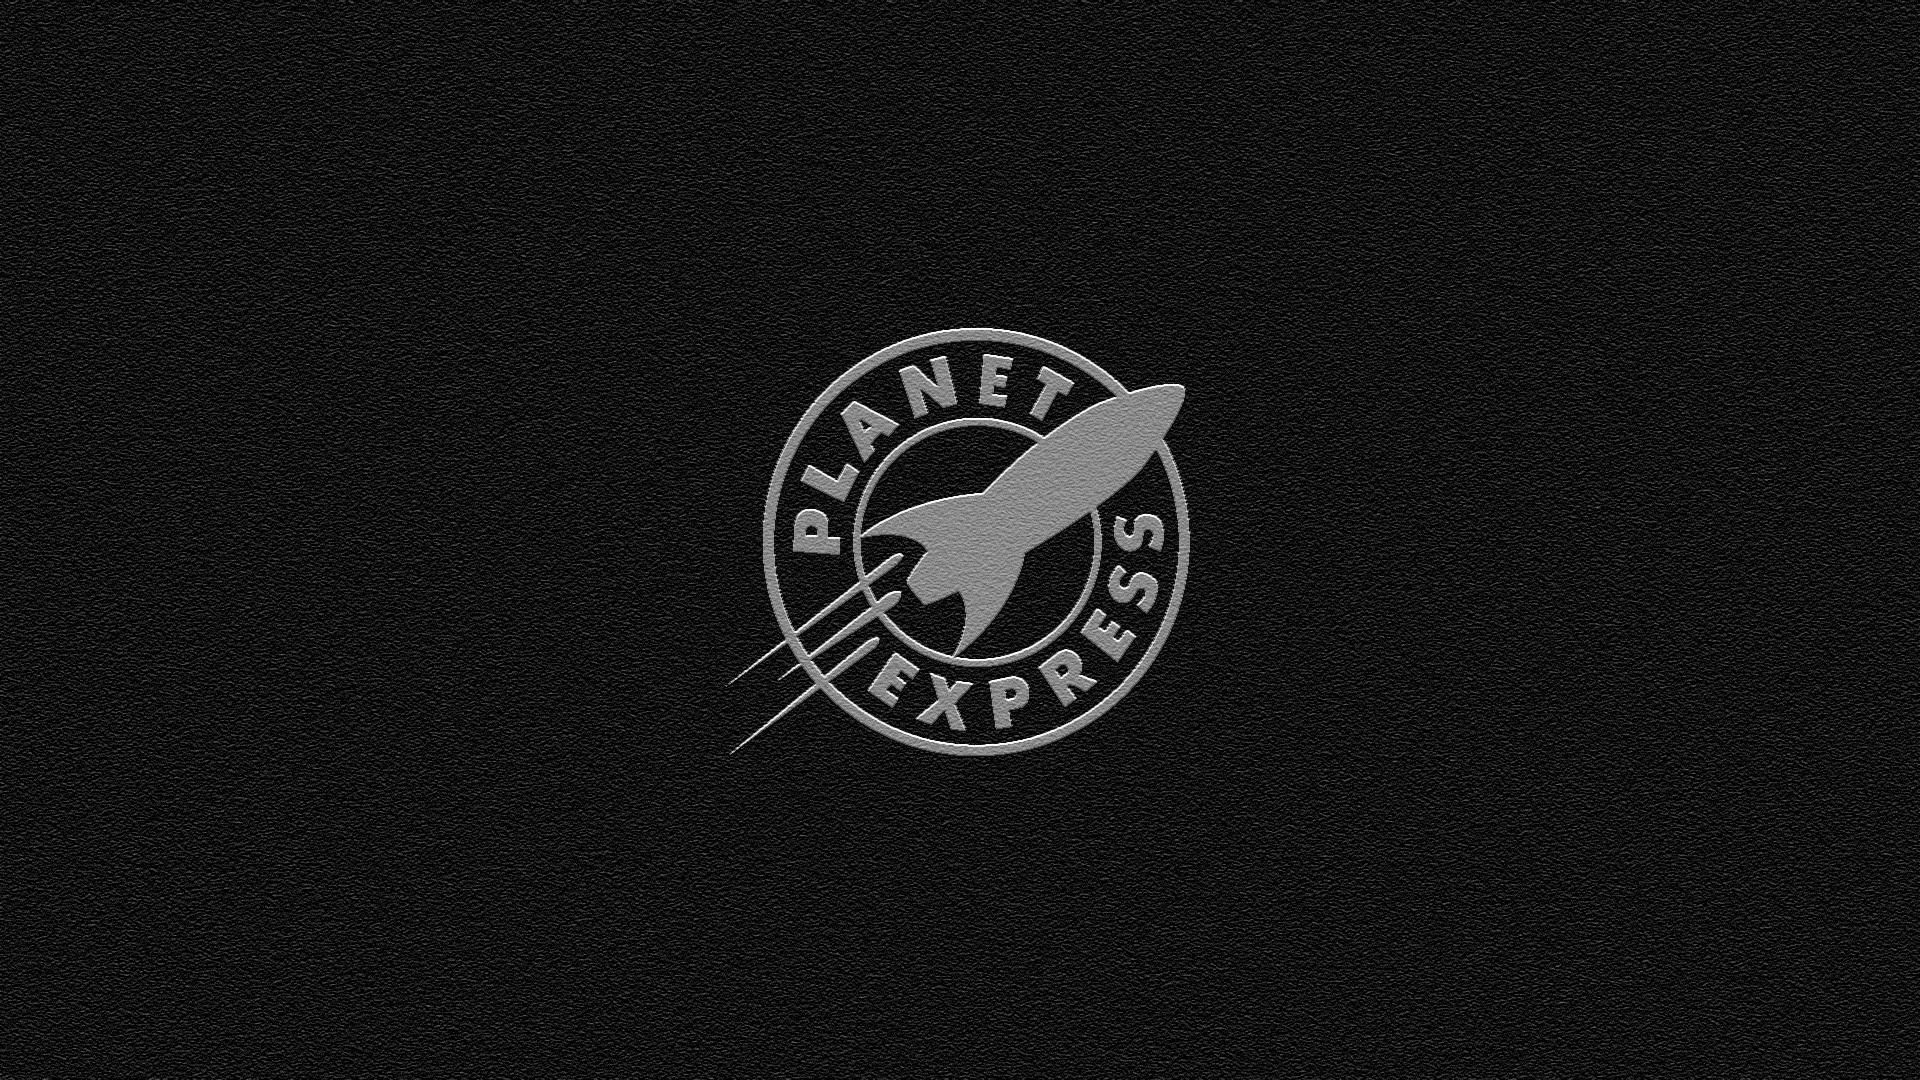 futurama planet express logo wallpaper 49603